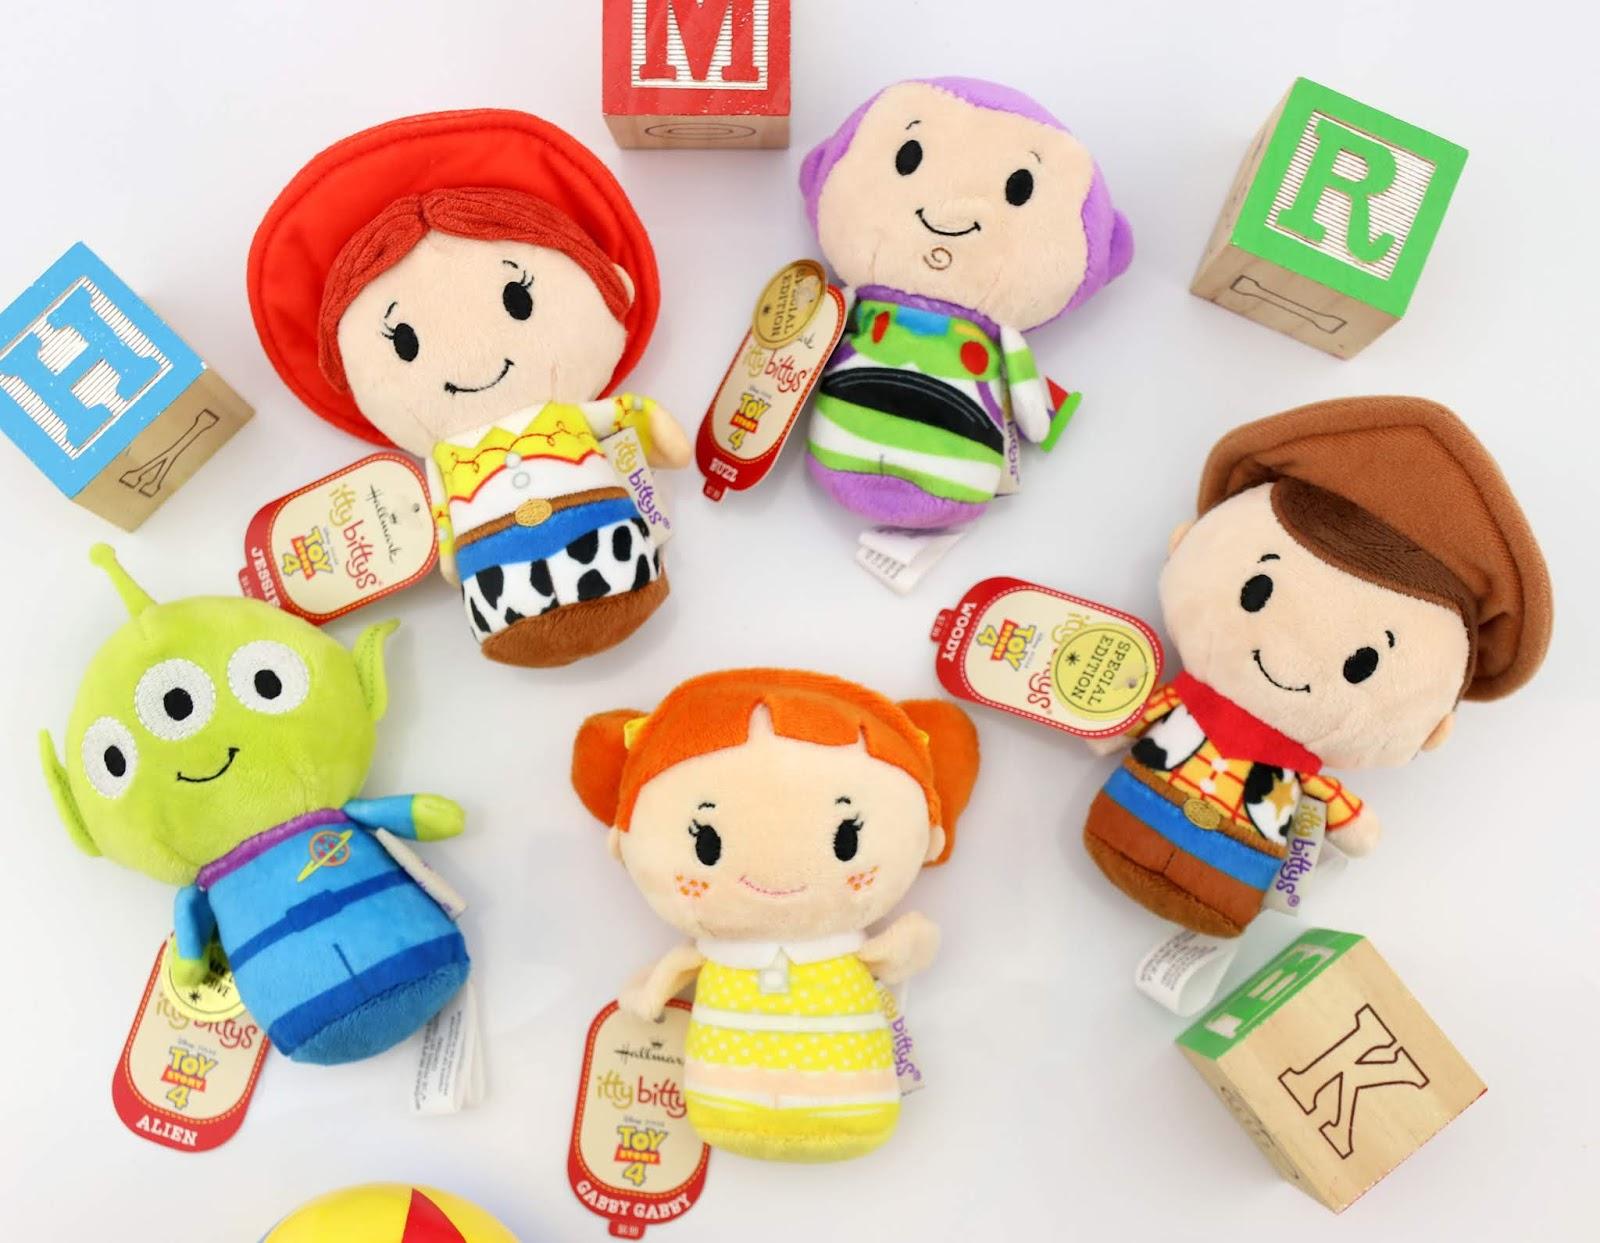 hallmark toy story 4 itty bittys